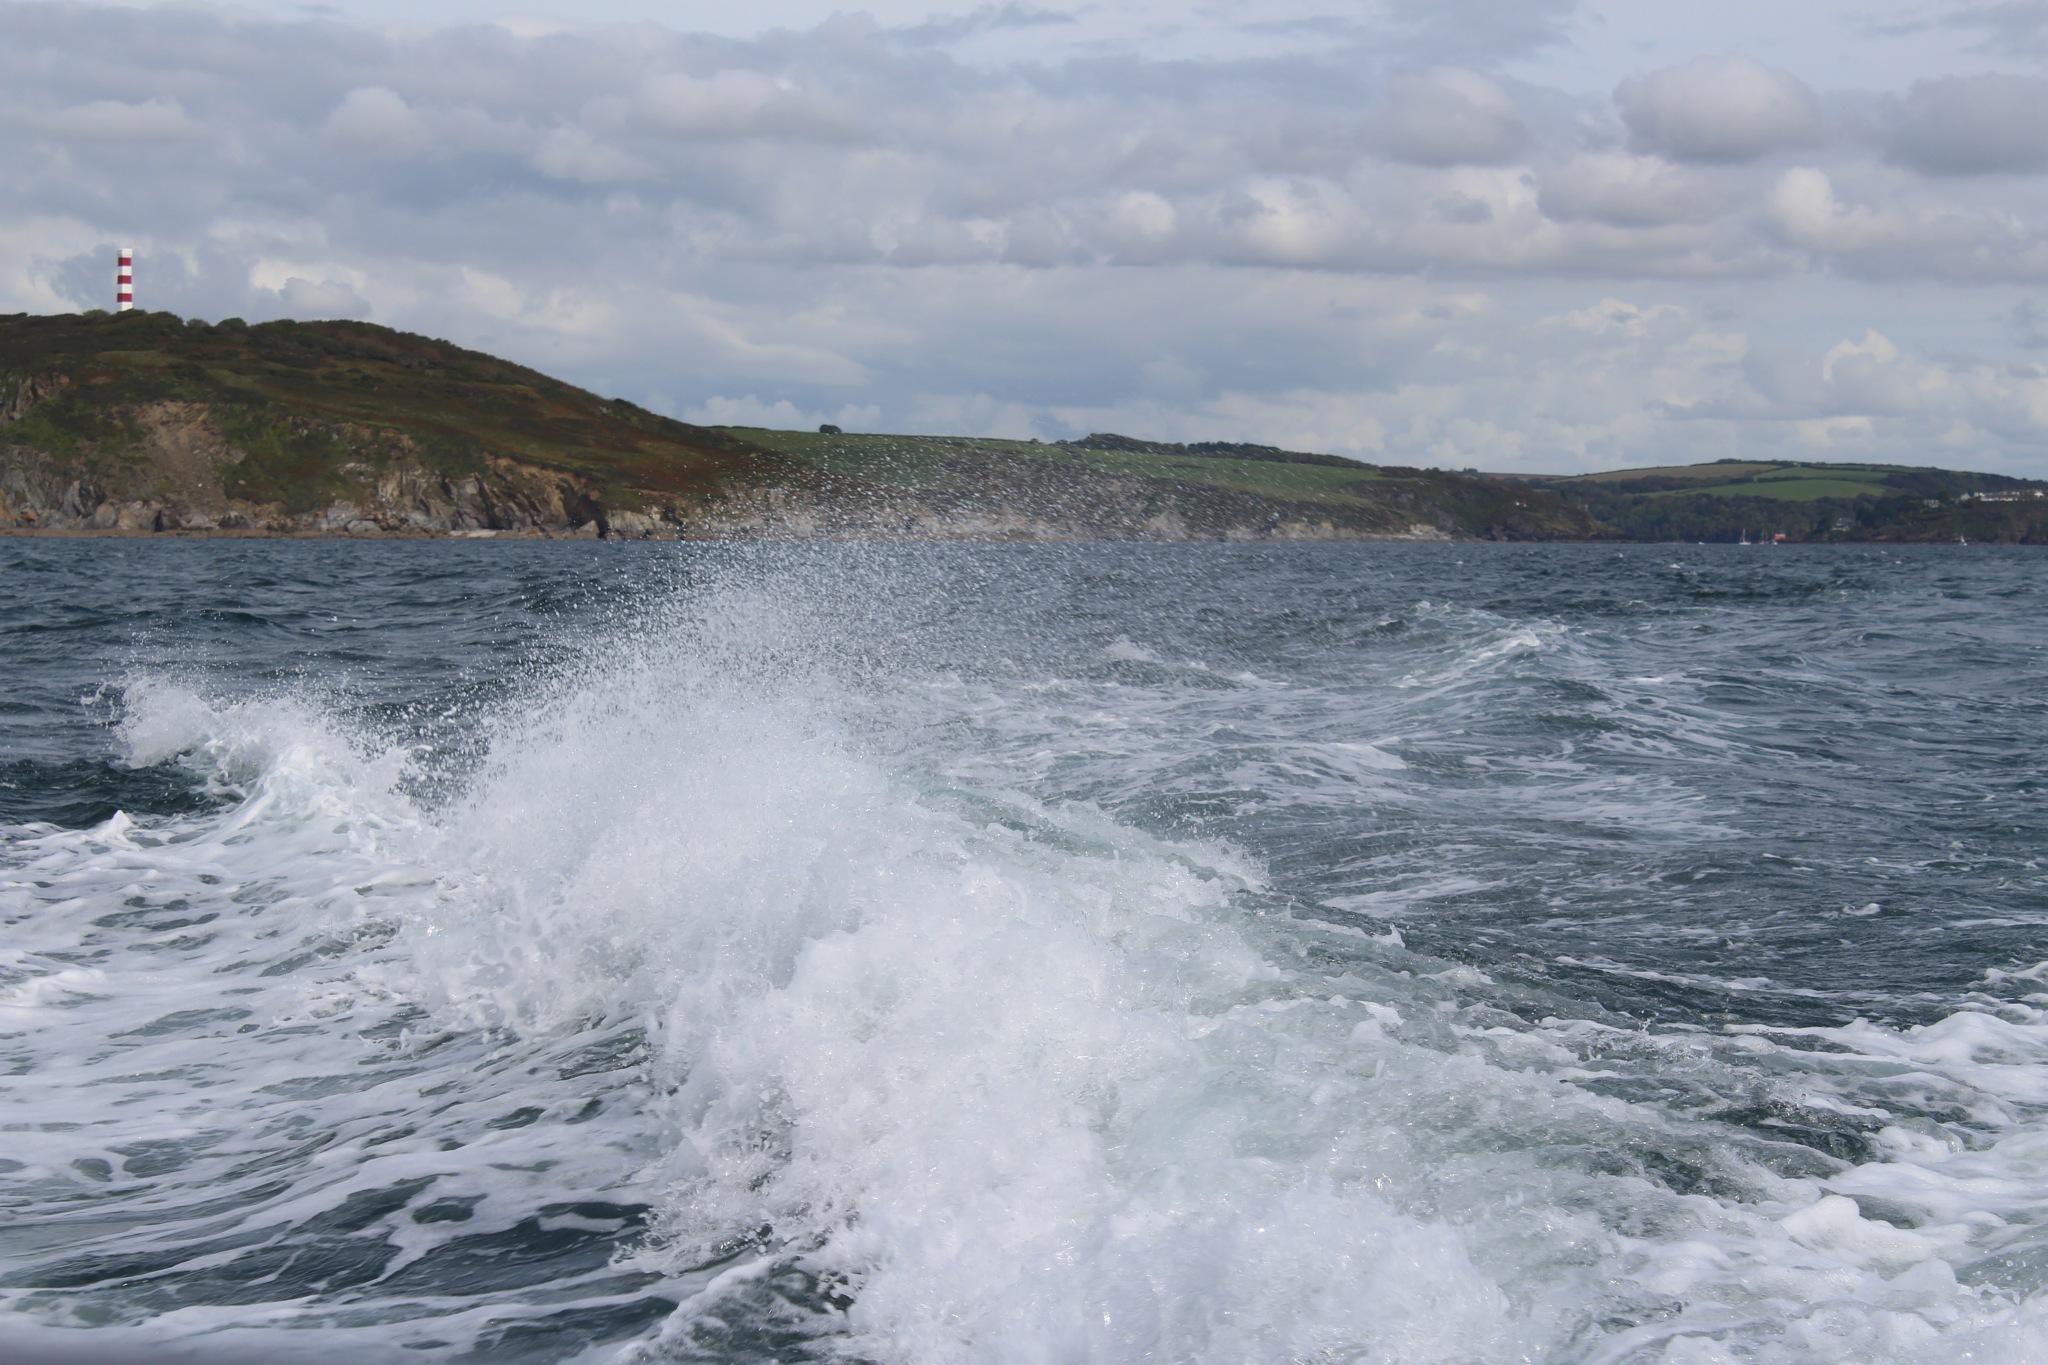 Splash Photography by drgeorgebaileybailey8